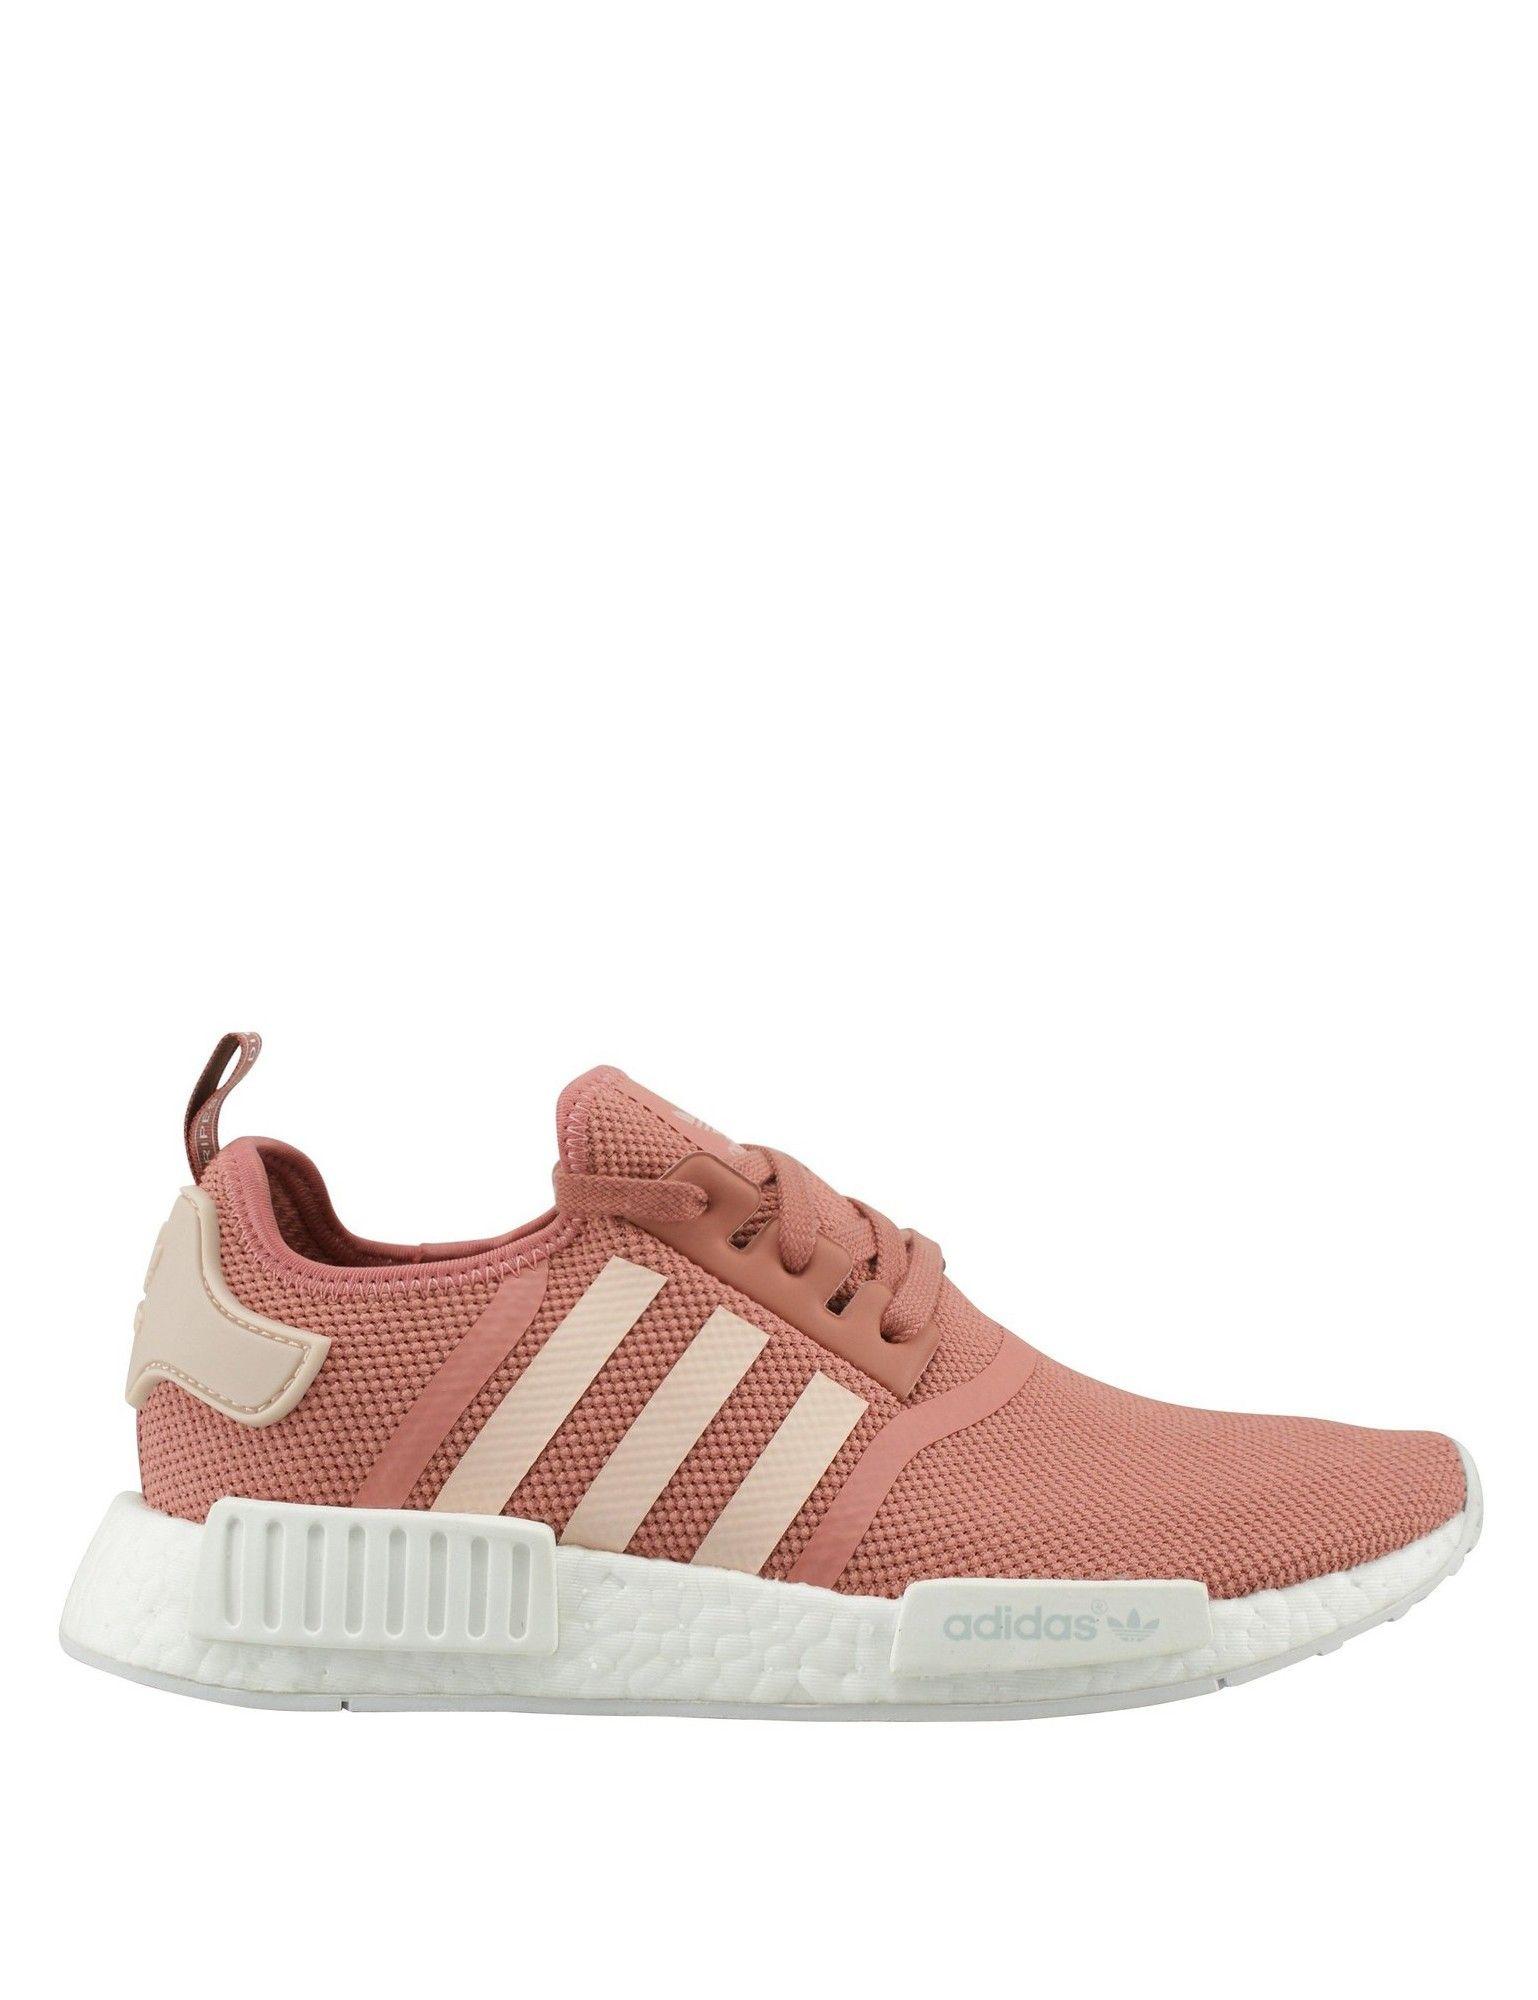 buy popular 8a5db 86c07 NMD R1 ΓΥΝΑΙΚΕΙΑ ΡΟΖ ΑΘΛΗΤΙΚΑ ΠΑΠΟΥΤΣΙΑ Adidas Originals, Adidas Sneakers, Adidas  Shoes